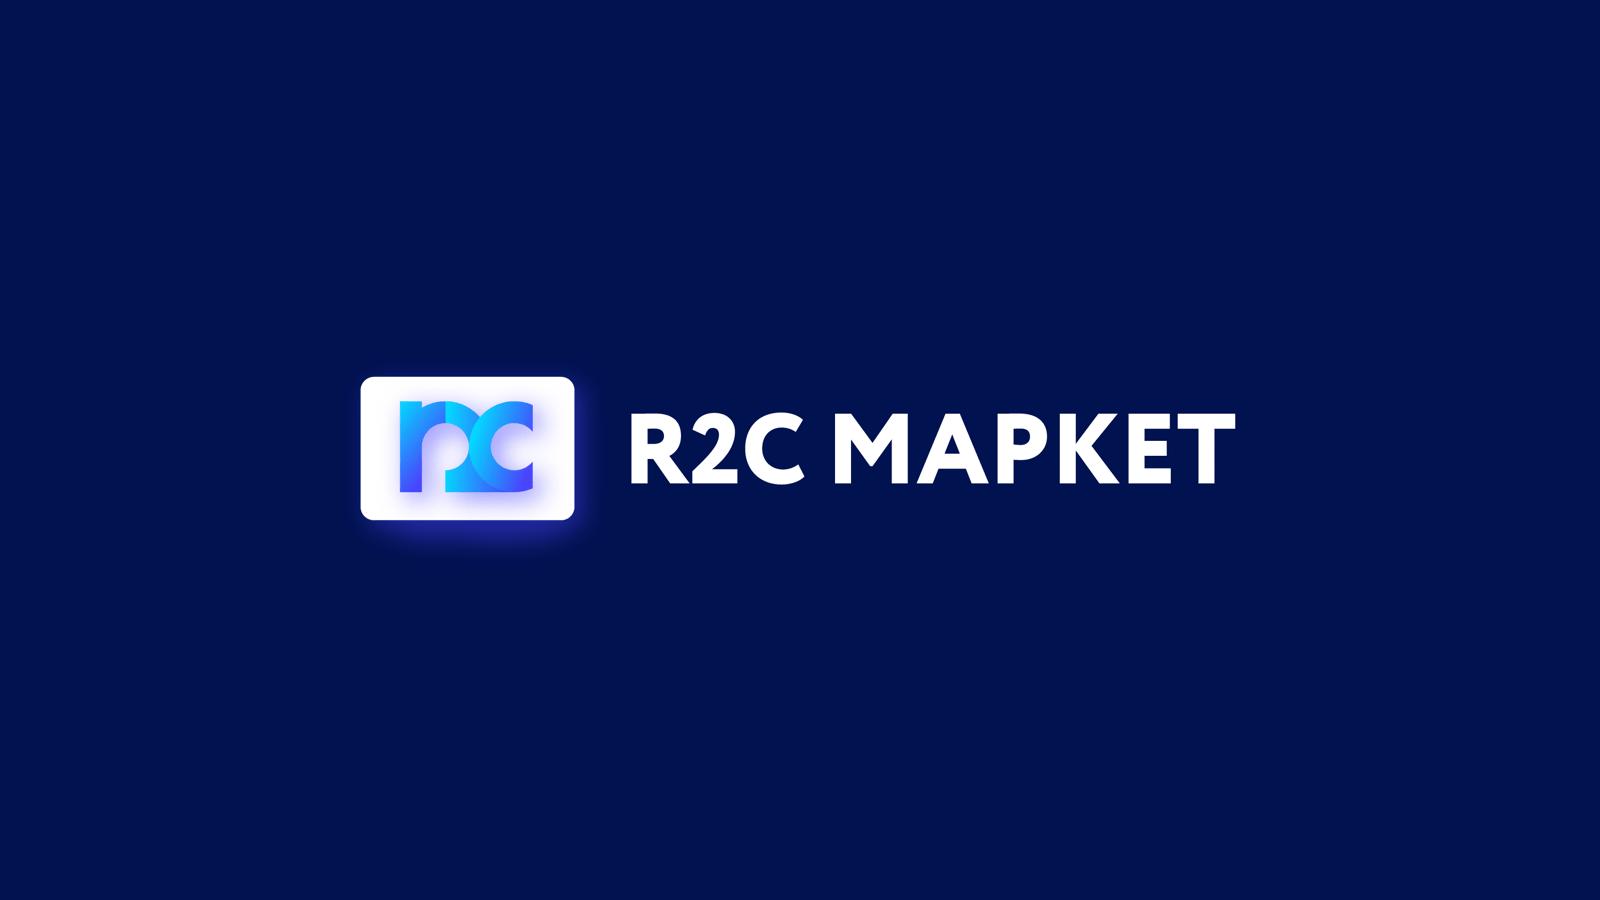 Разработка логотипа для IT компании